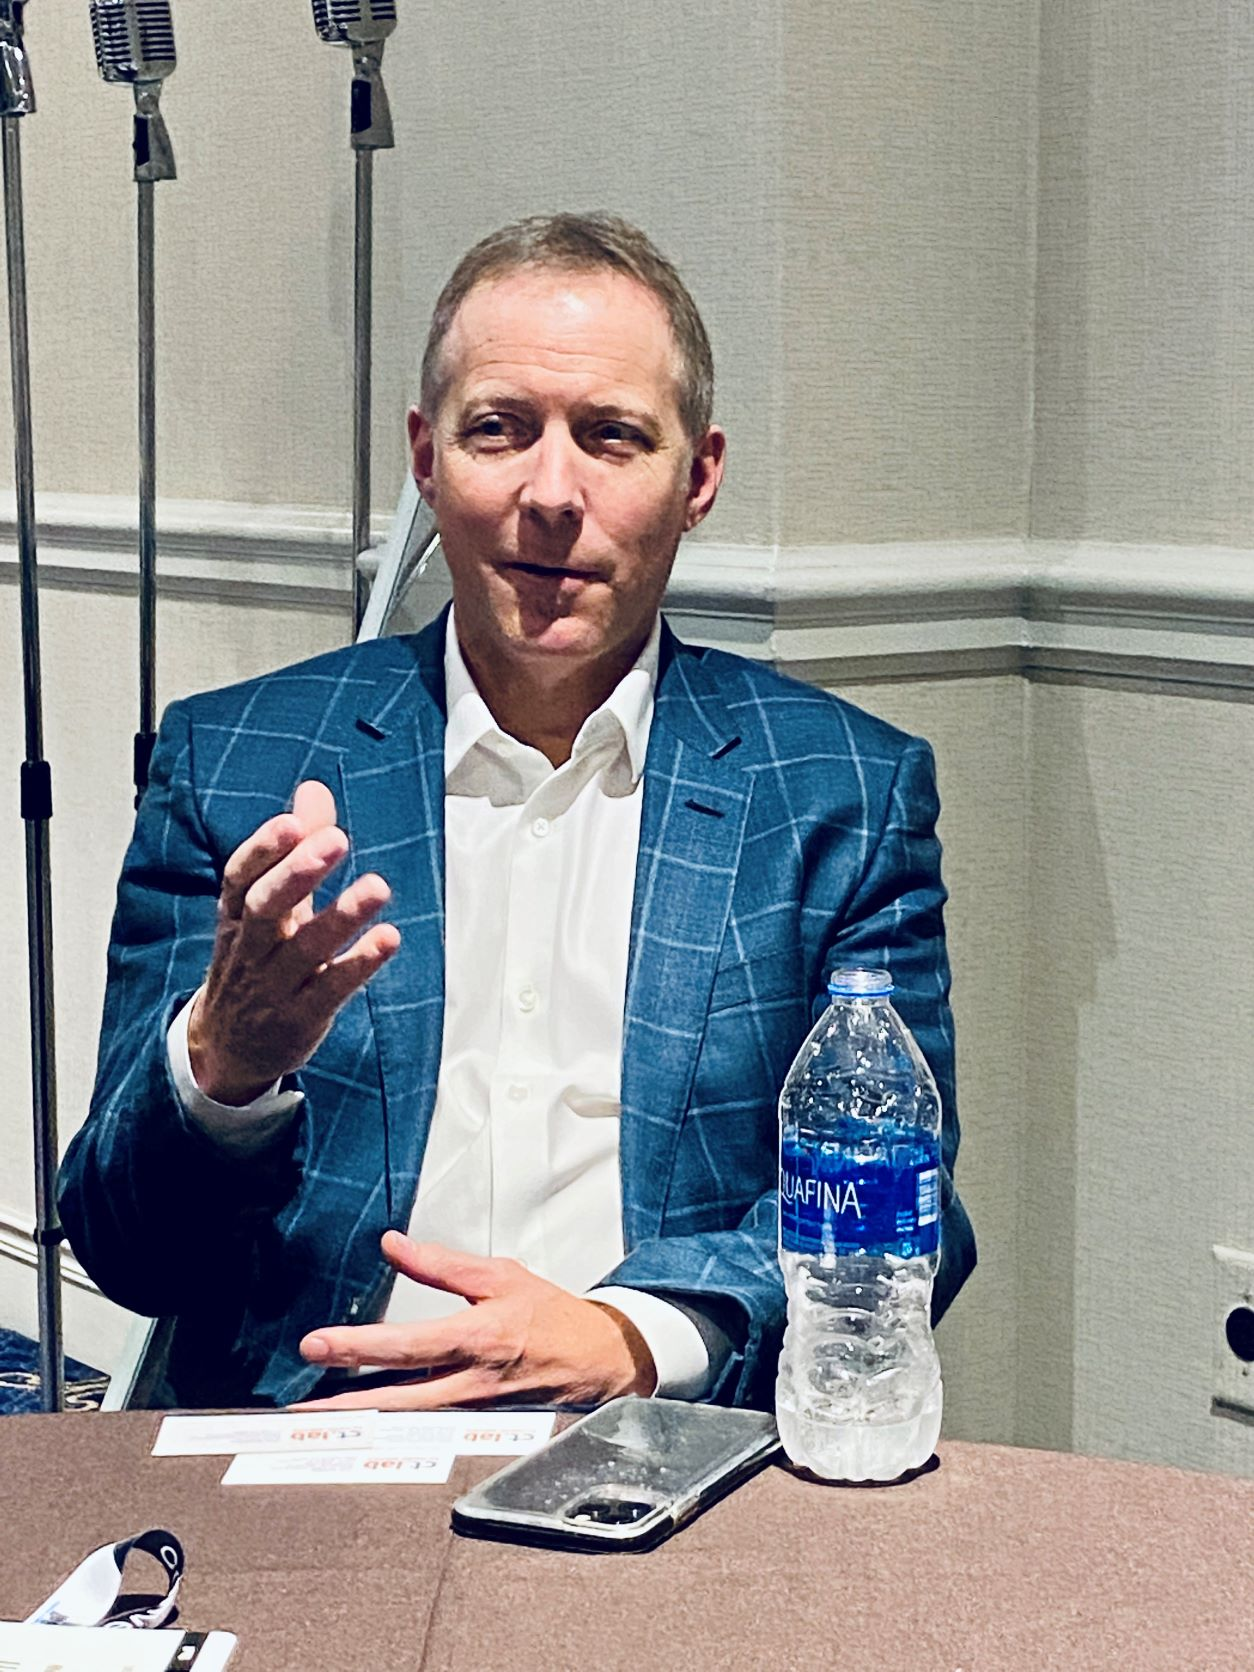 BrandSource CEO Jim Ristow